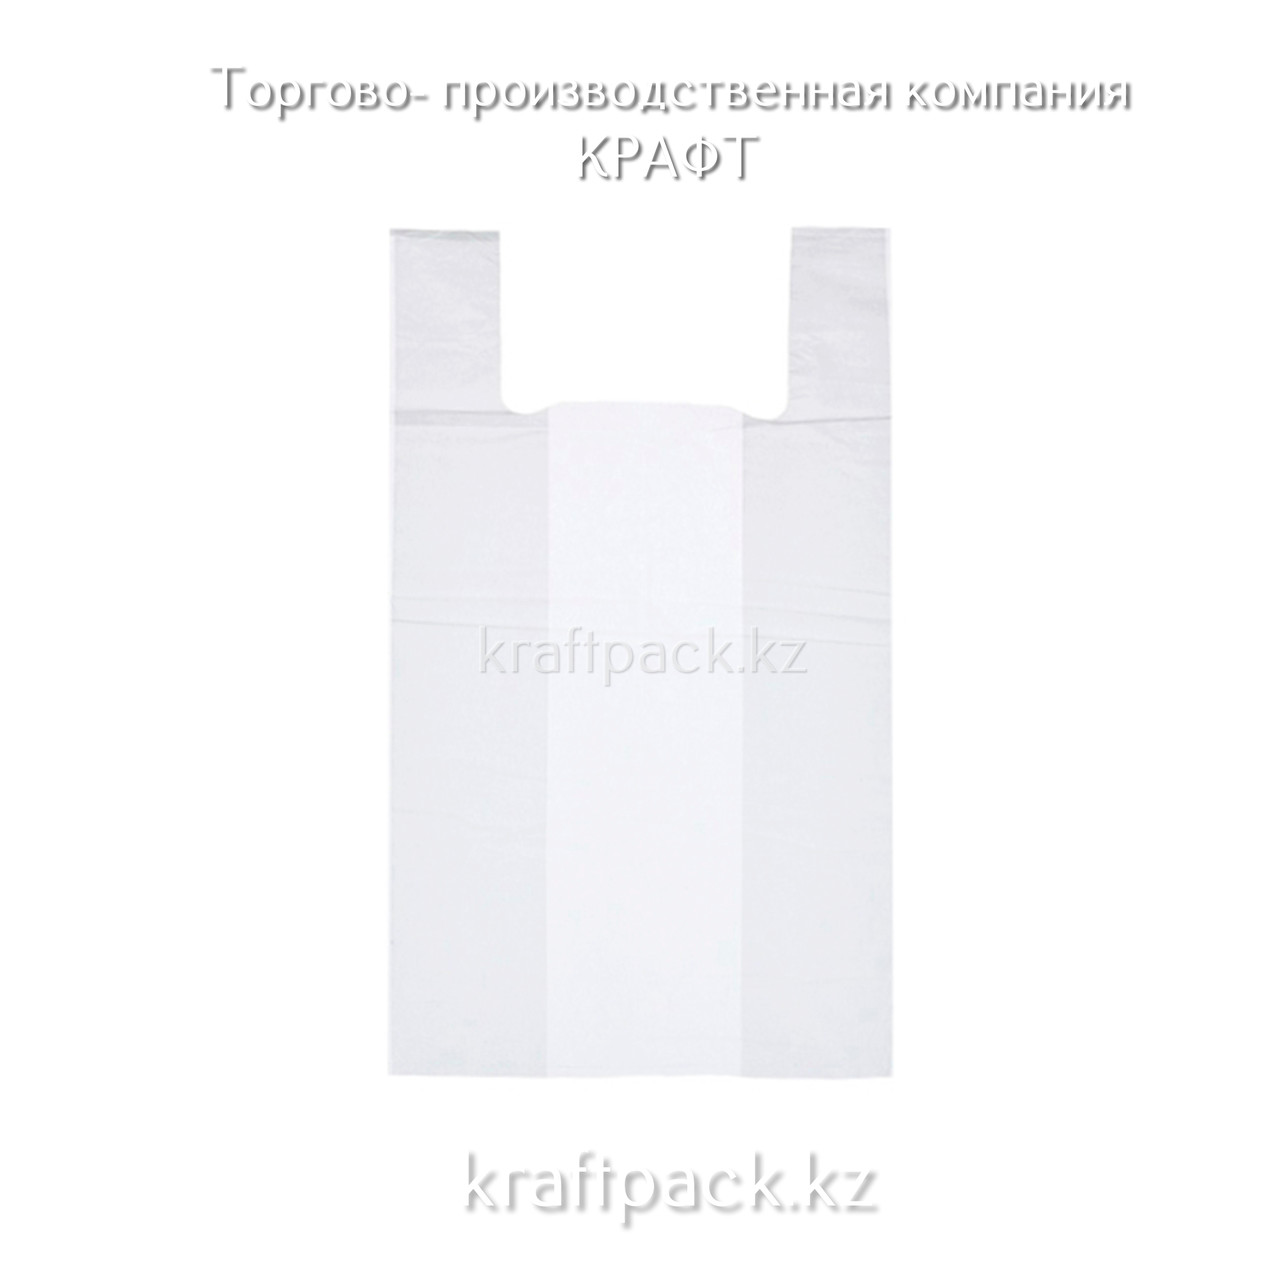 Пакет майка ПНД 28см+14см*50см белая - 100шт (30уп/кор)